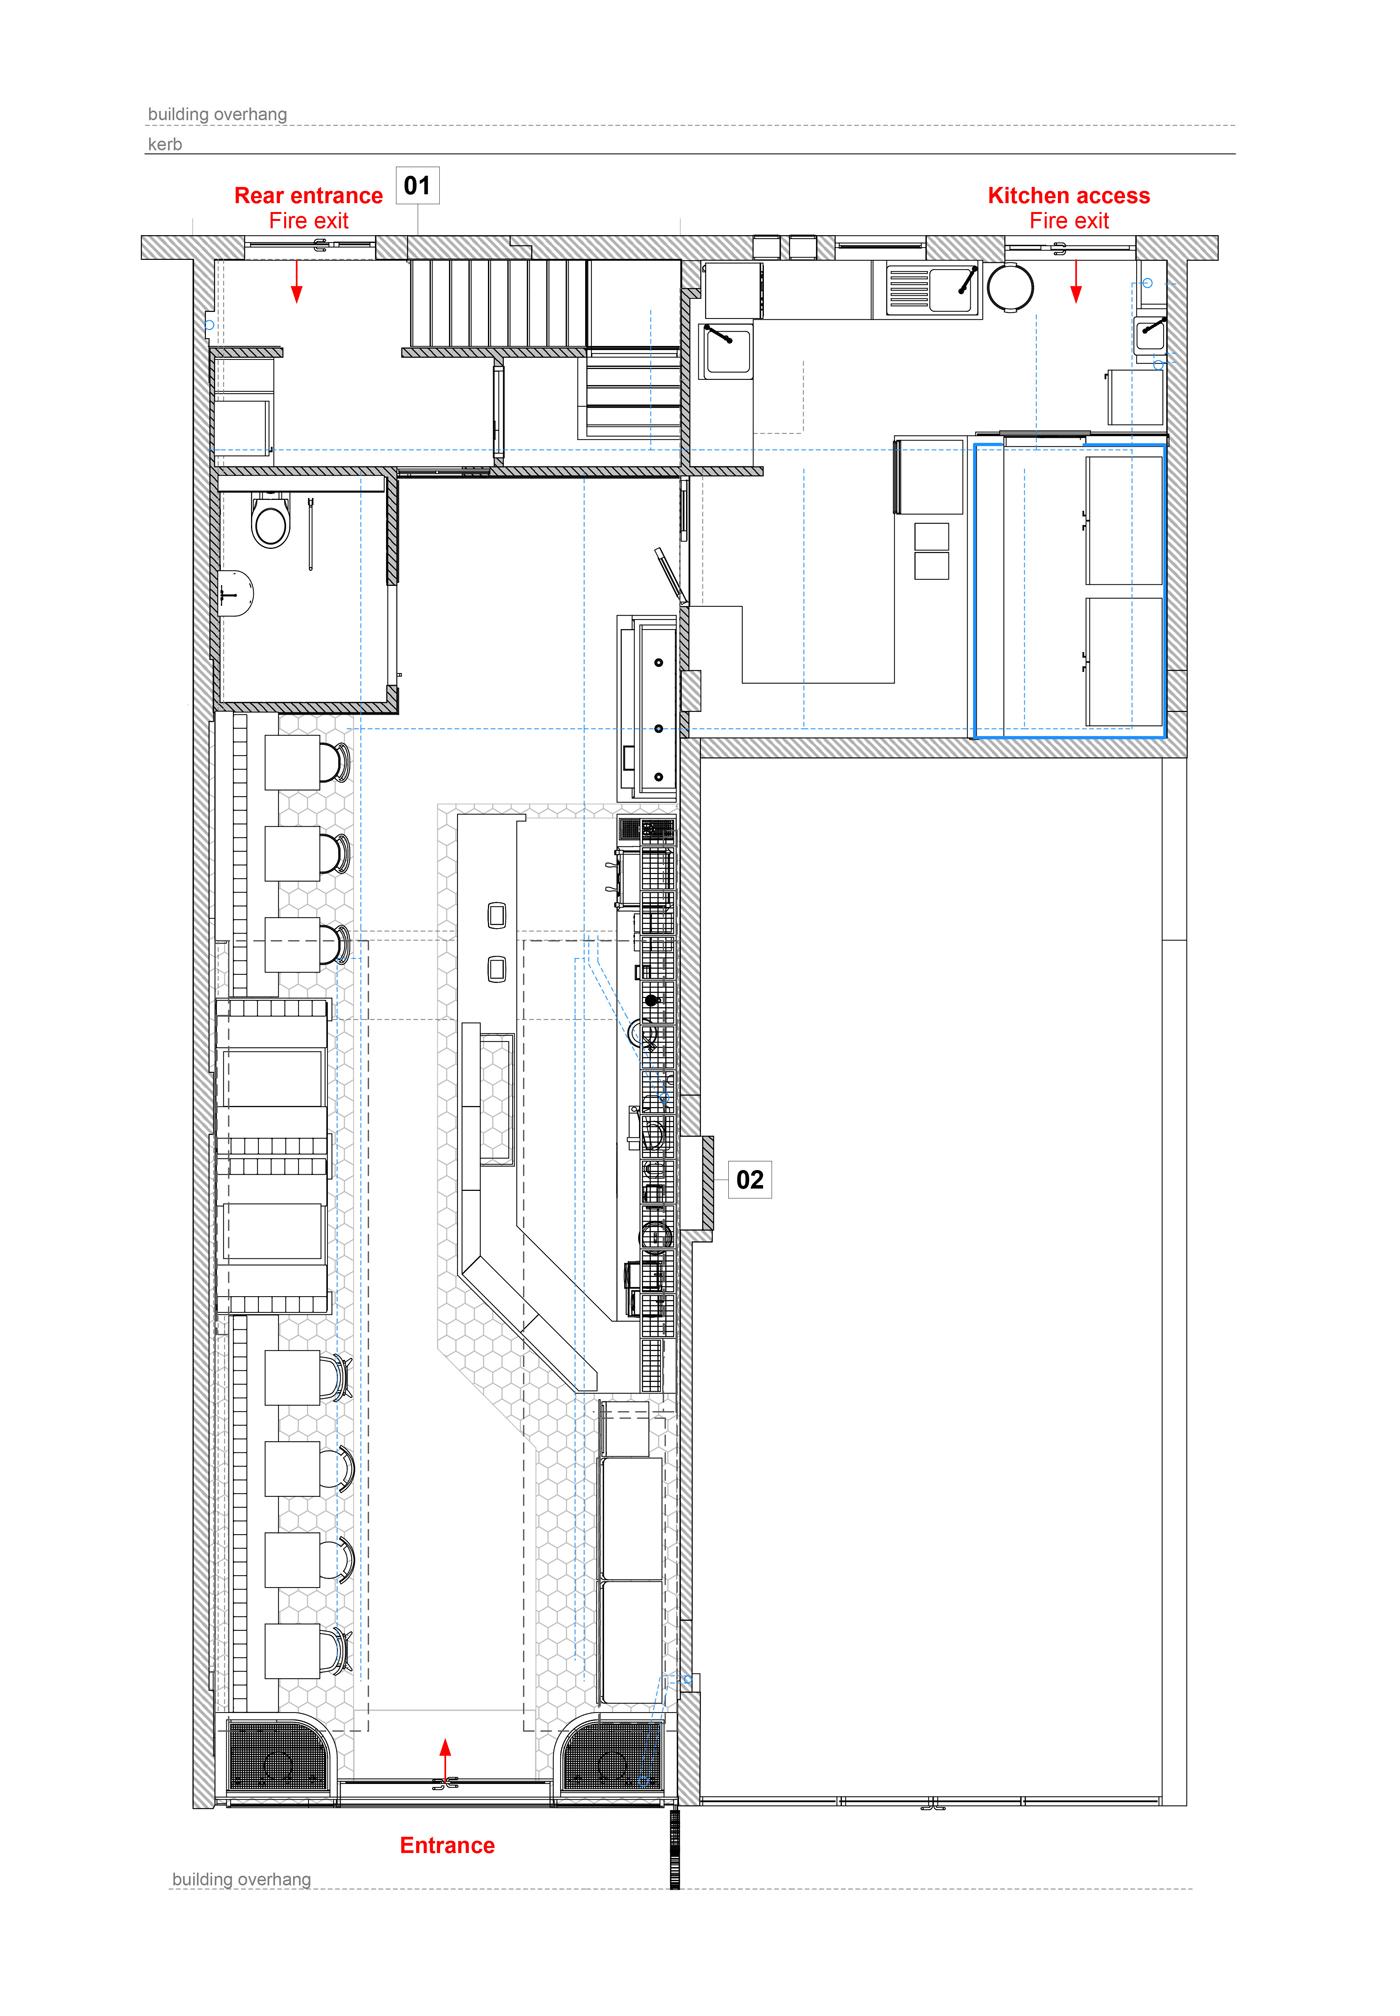 Yeo_Valley_Ground_Floor_plan.jpg